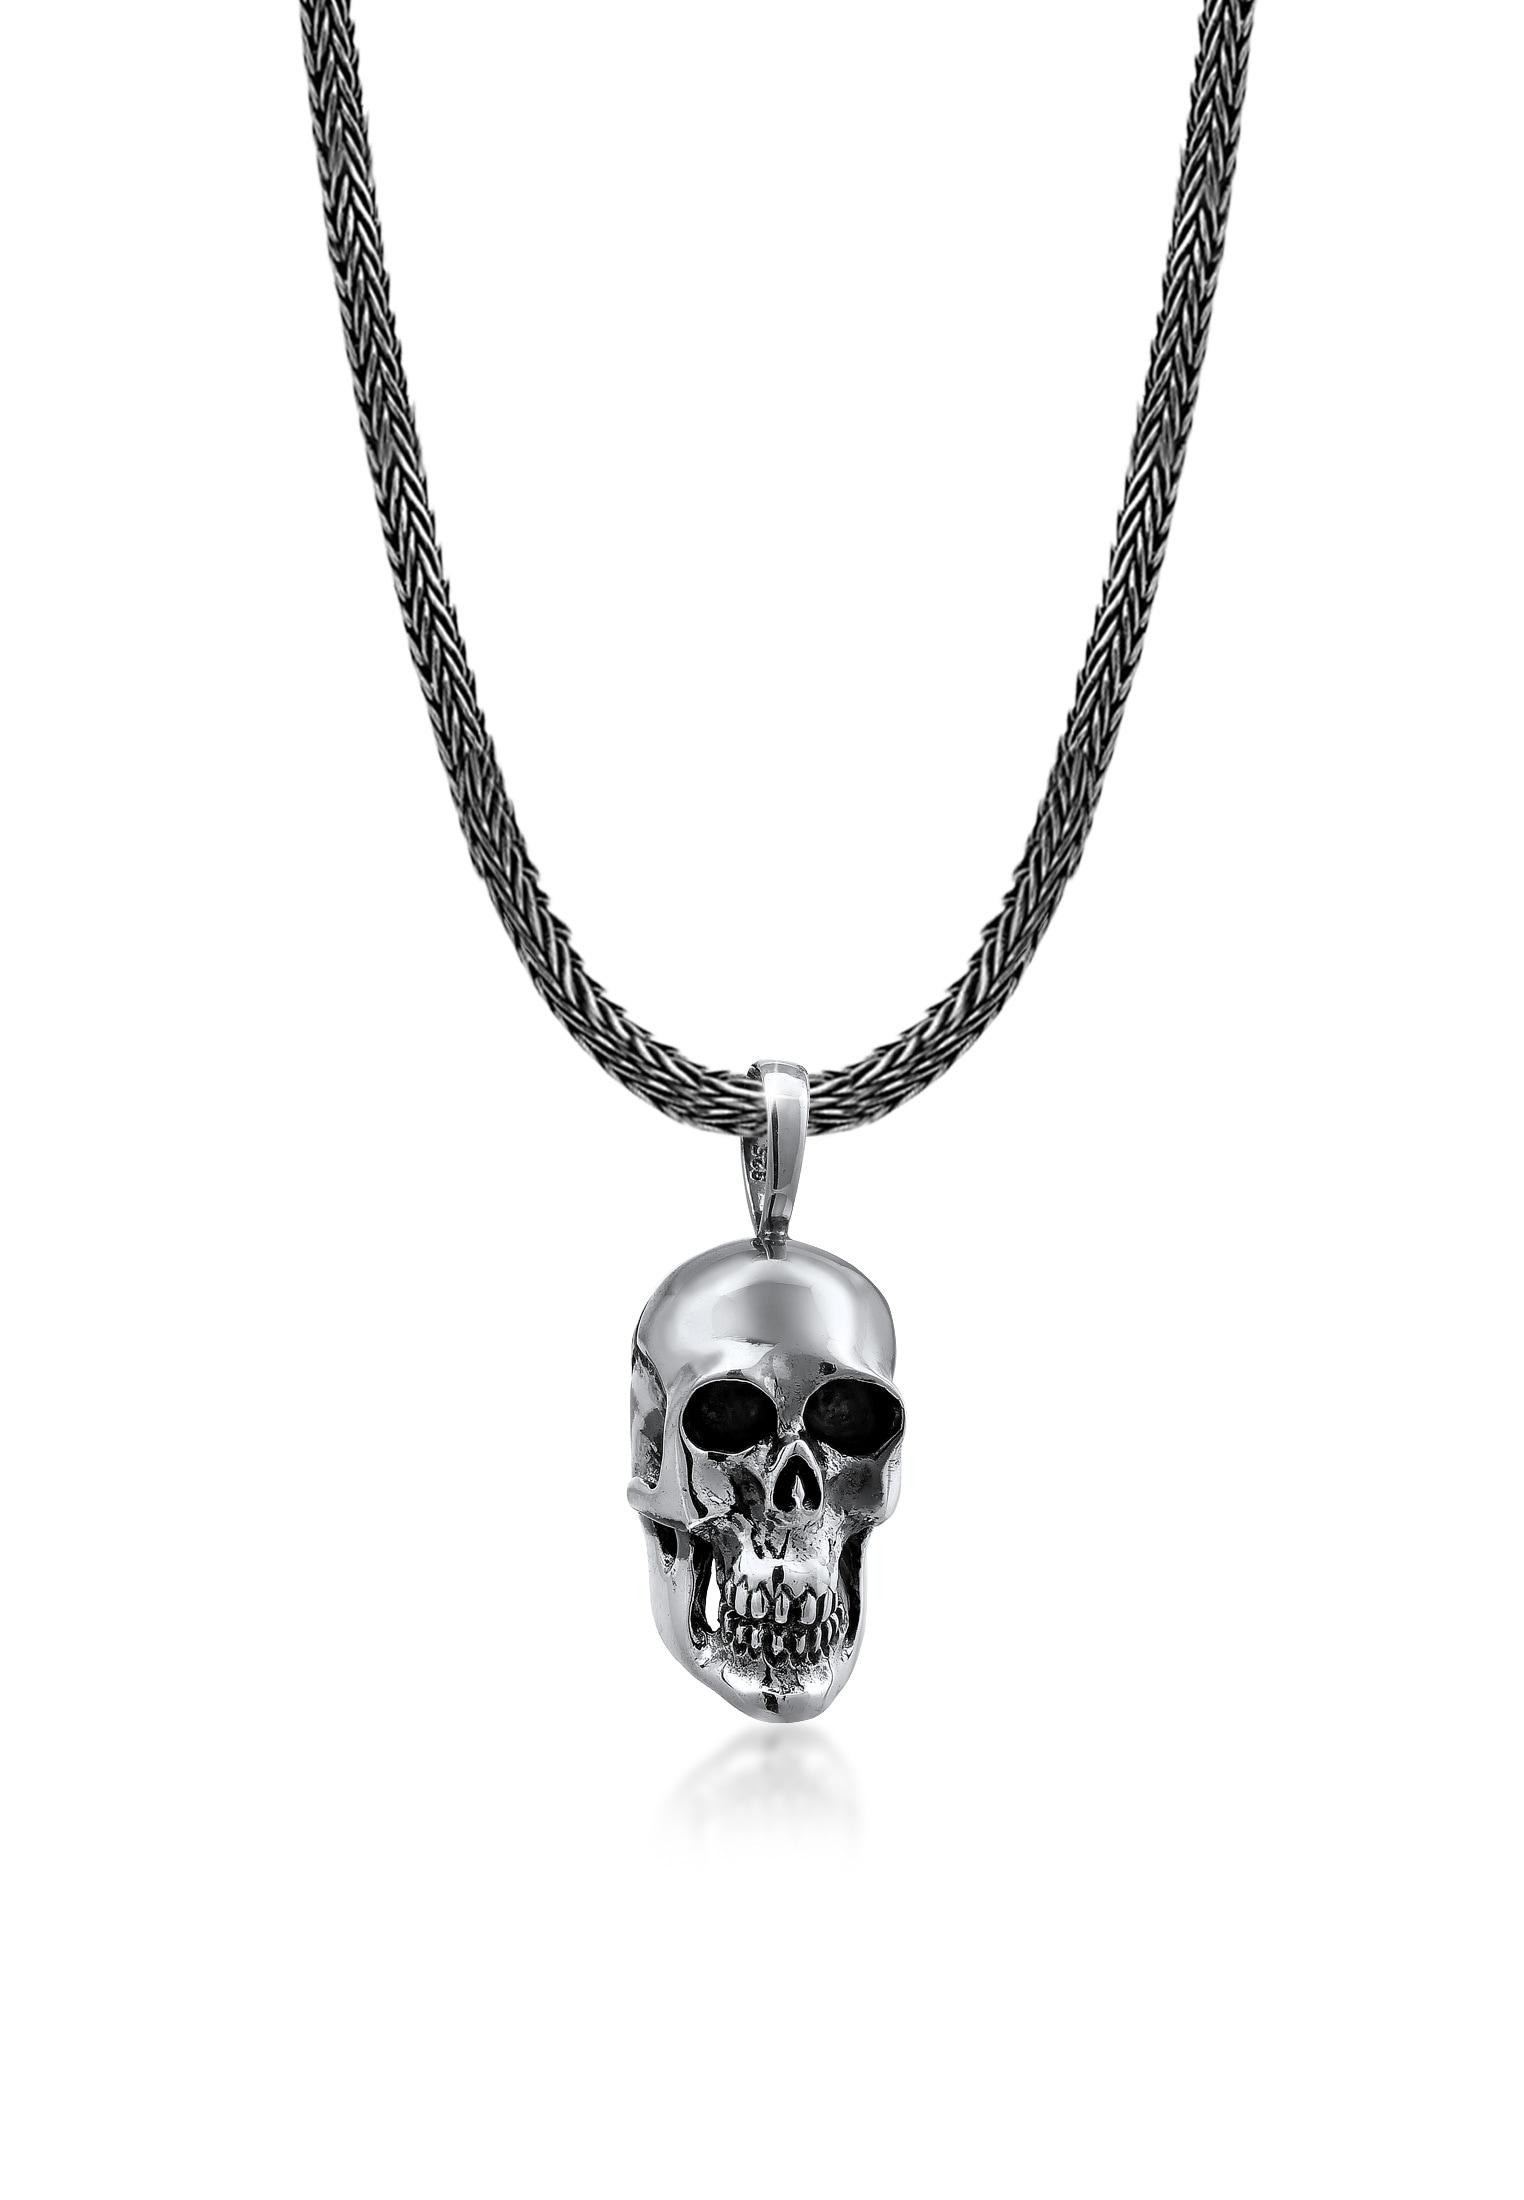 Kuzzoi Silberkette Männerkette Totenkopf Anhänger Massiv 925 Silber | Schmuck > Halsketten | Kuzzoi